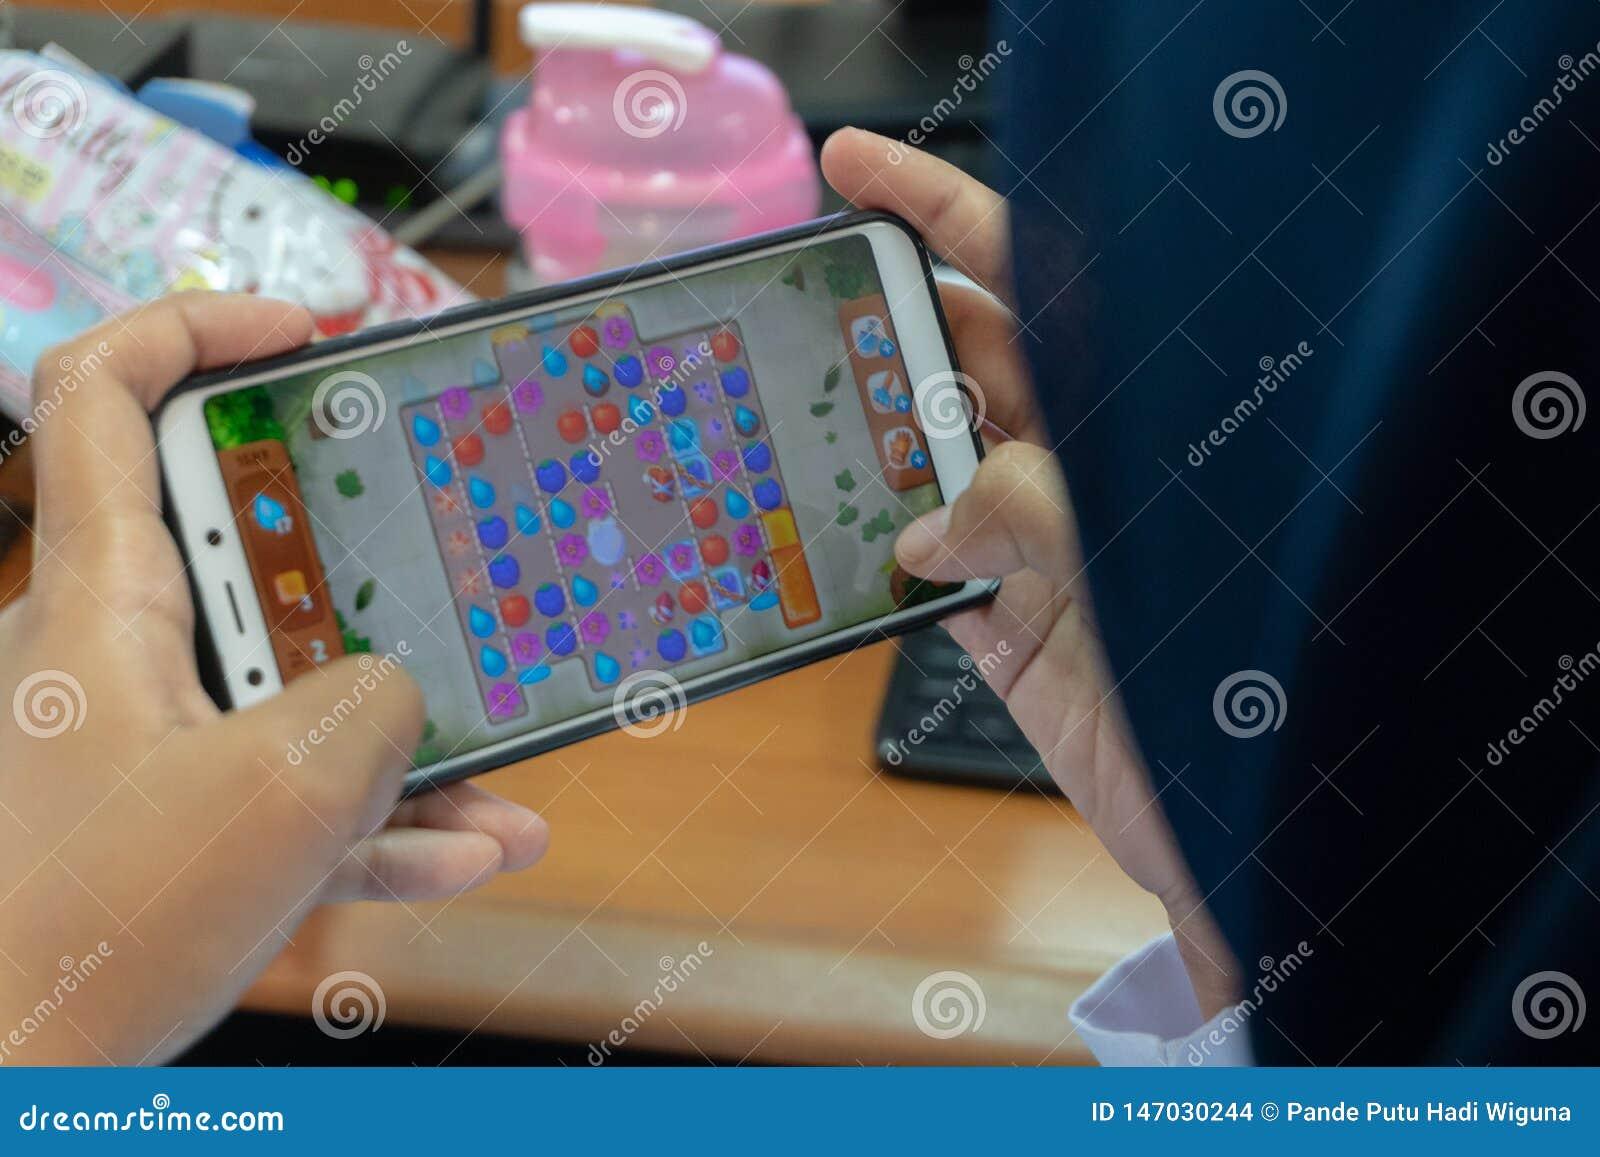 DENPASAR/BALI- 27 ΜΑΡΤΊΟΥ 2019: μια γυναίκα που χρησιμοποιεί ένα hijab έχει δροσιά τα παίζοντας παιχνίδια στο κινητό τηλέφωνο της